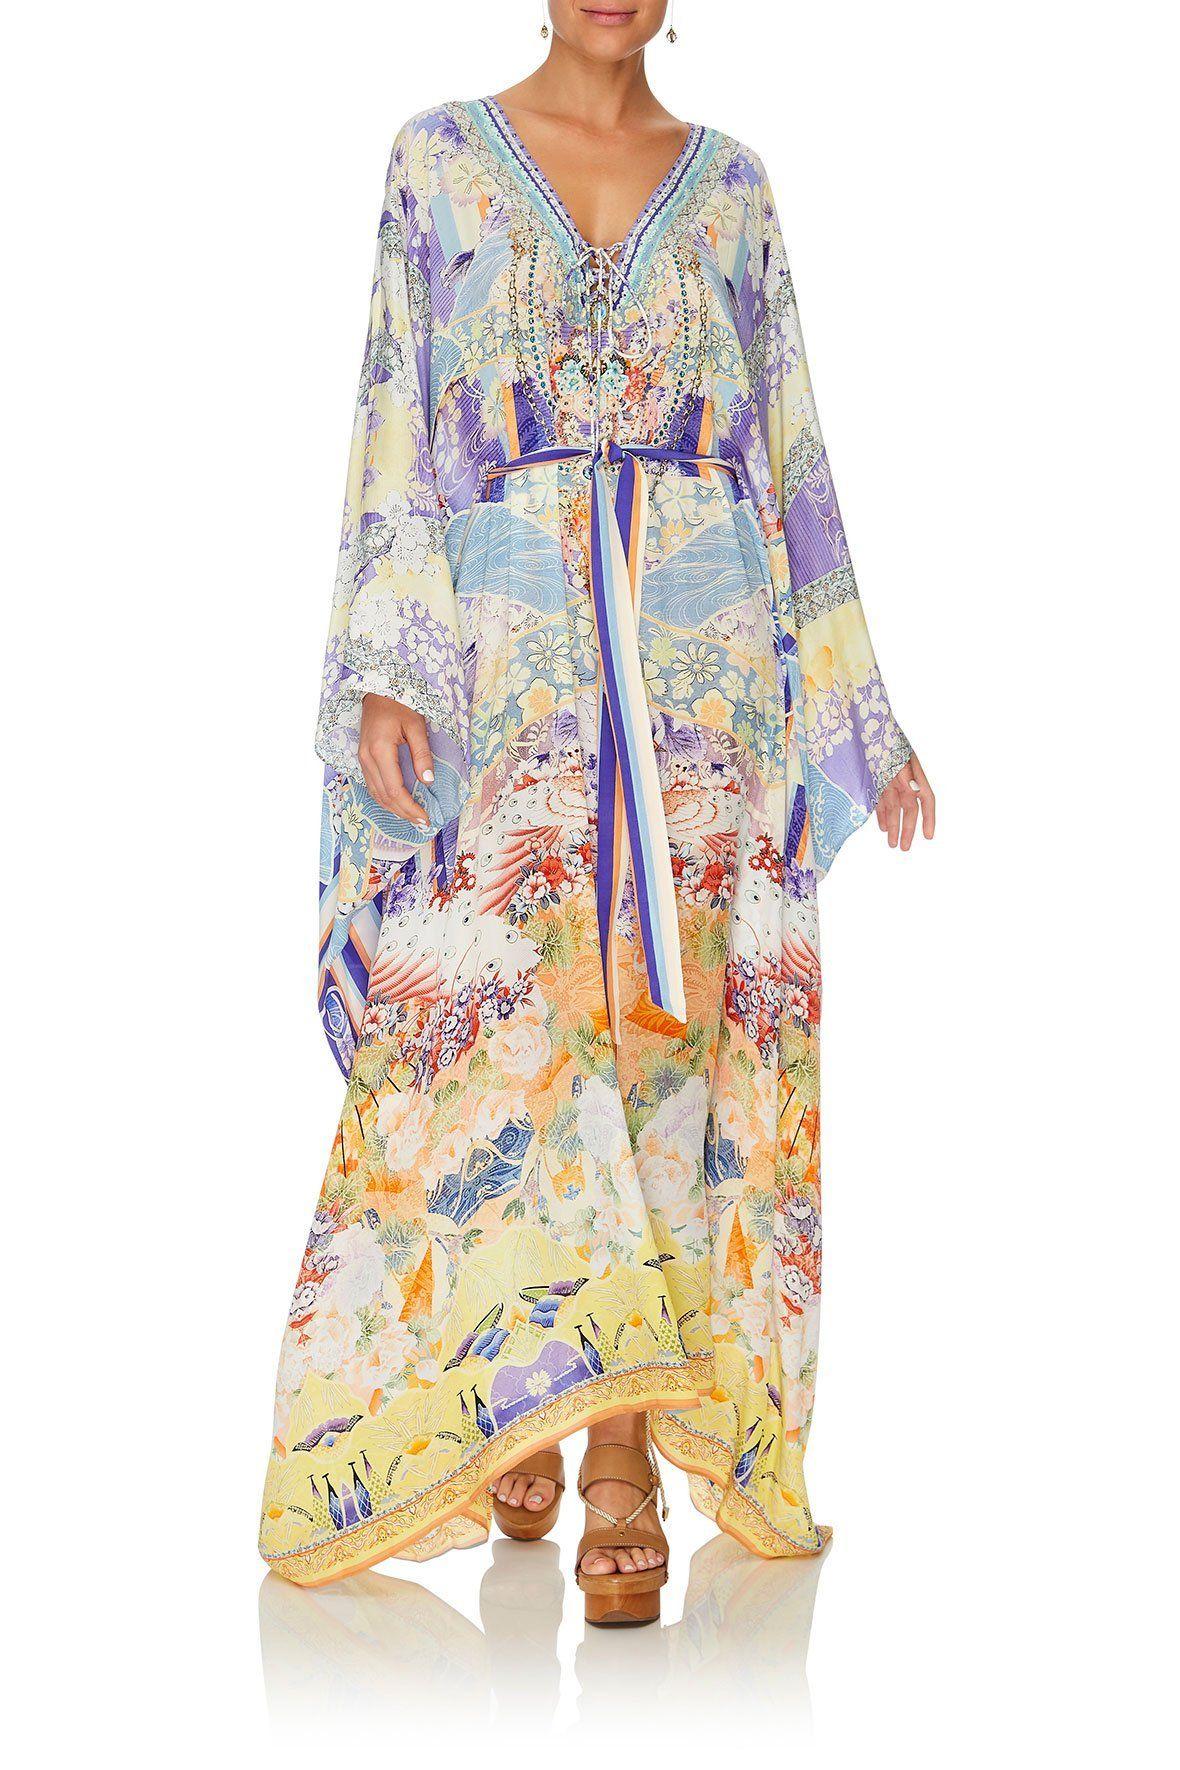 d9e05350c5 Camilla  Girl In The Kimono - Split Hem Lace Up Kaftan - Michelle Ann